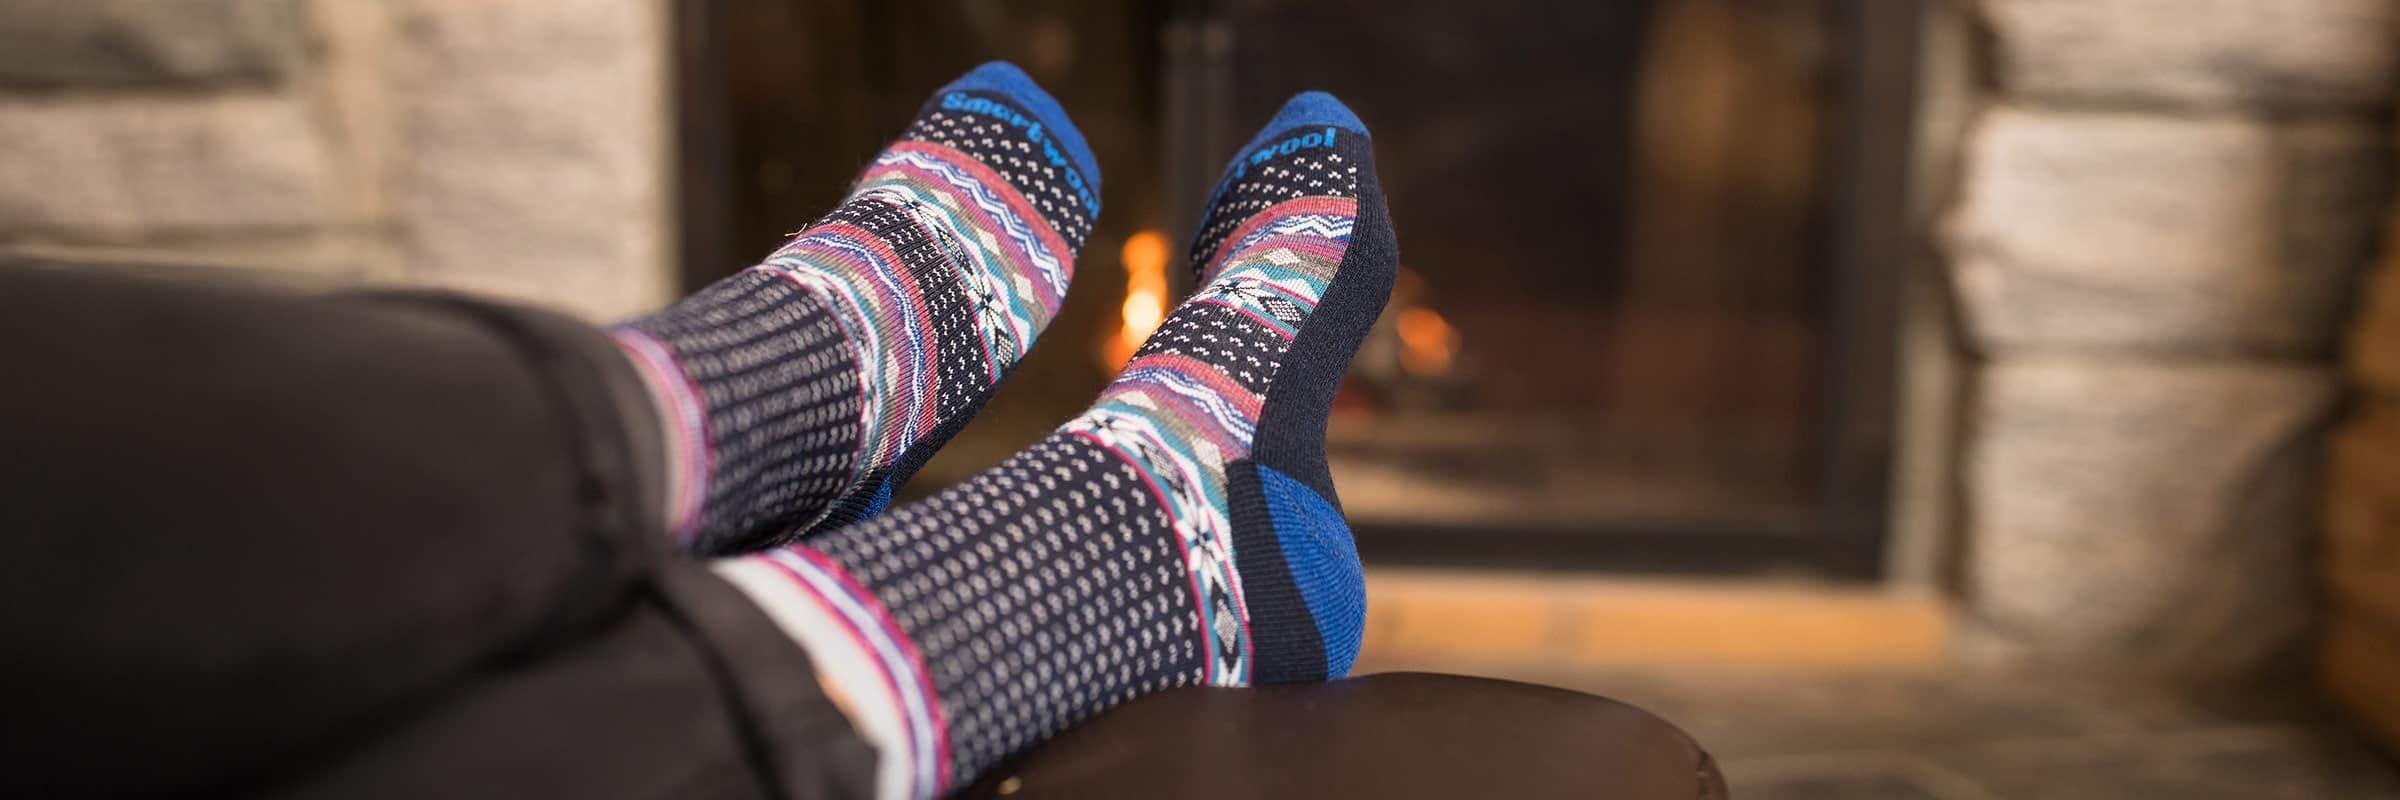 Burton, Darn Tough, Icebreaker, Instance, Kari Traa, Smartwool, Wigwam. Christmas Socks Gift Ideas